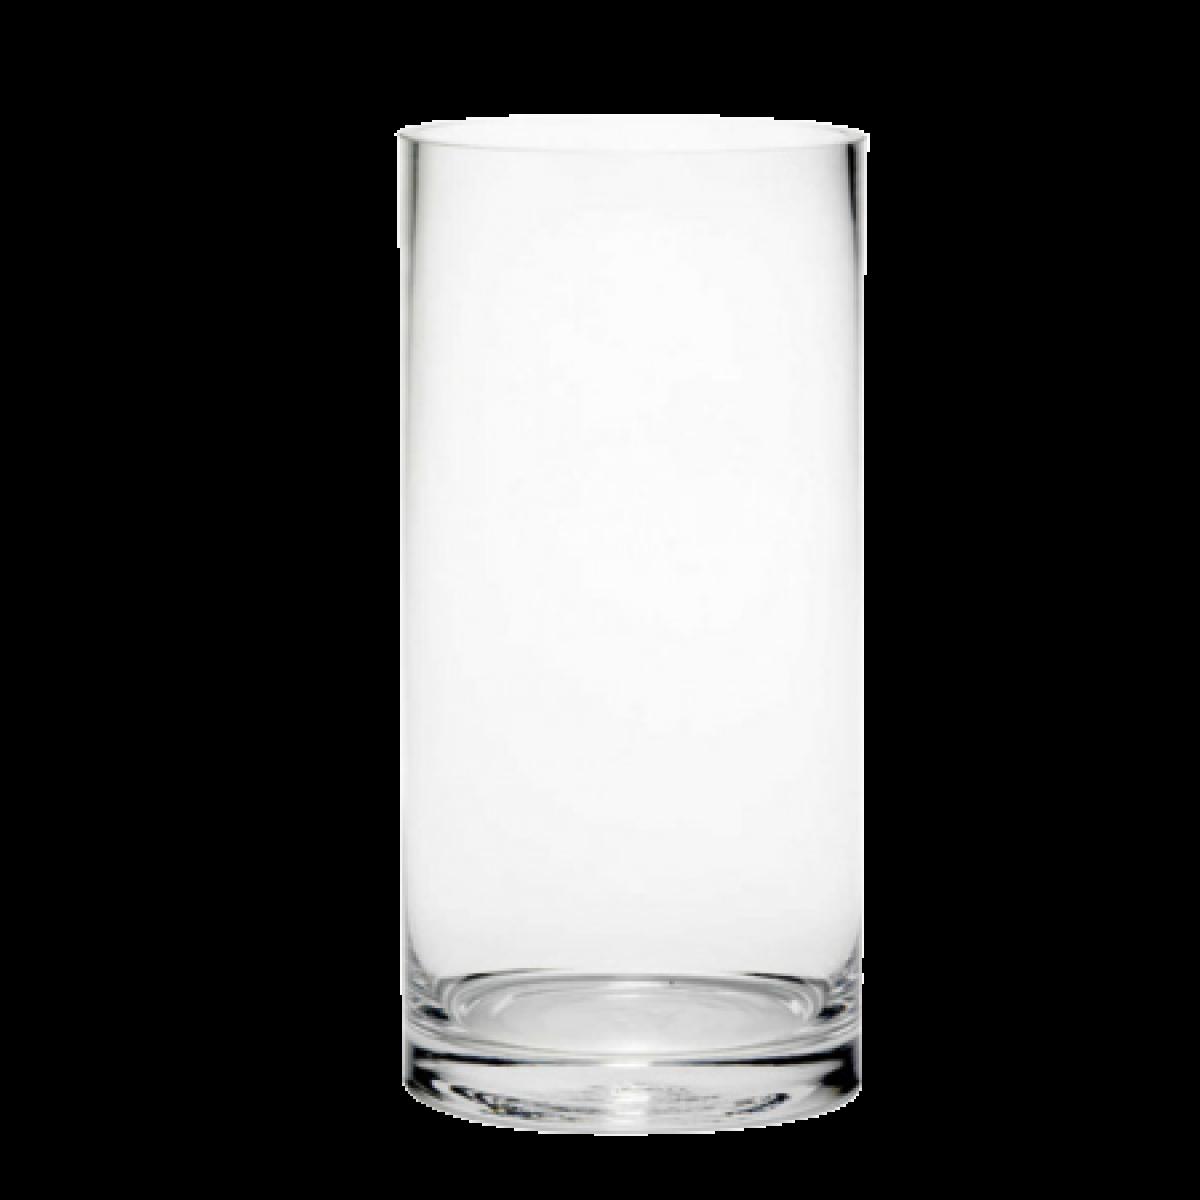 5116 Cylinder Clear 12x25cm Acrylic Vase - 1 No